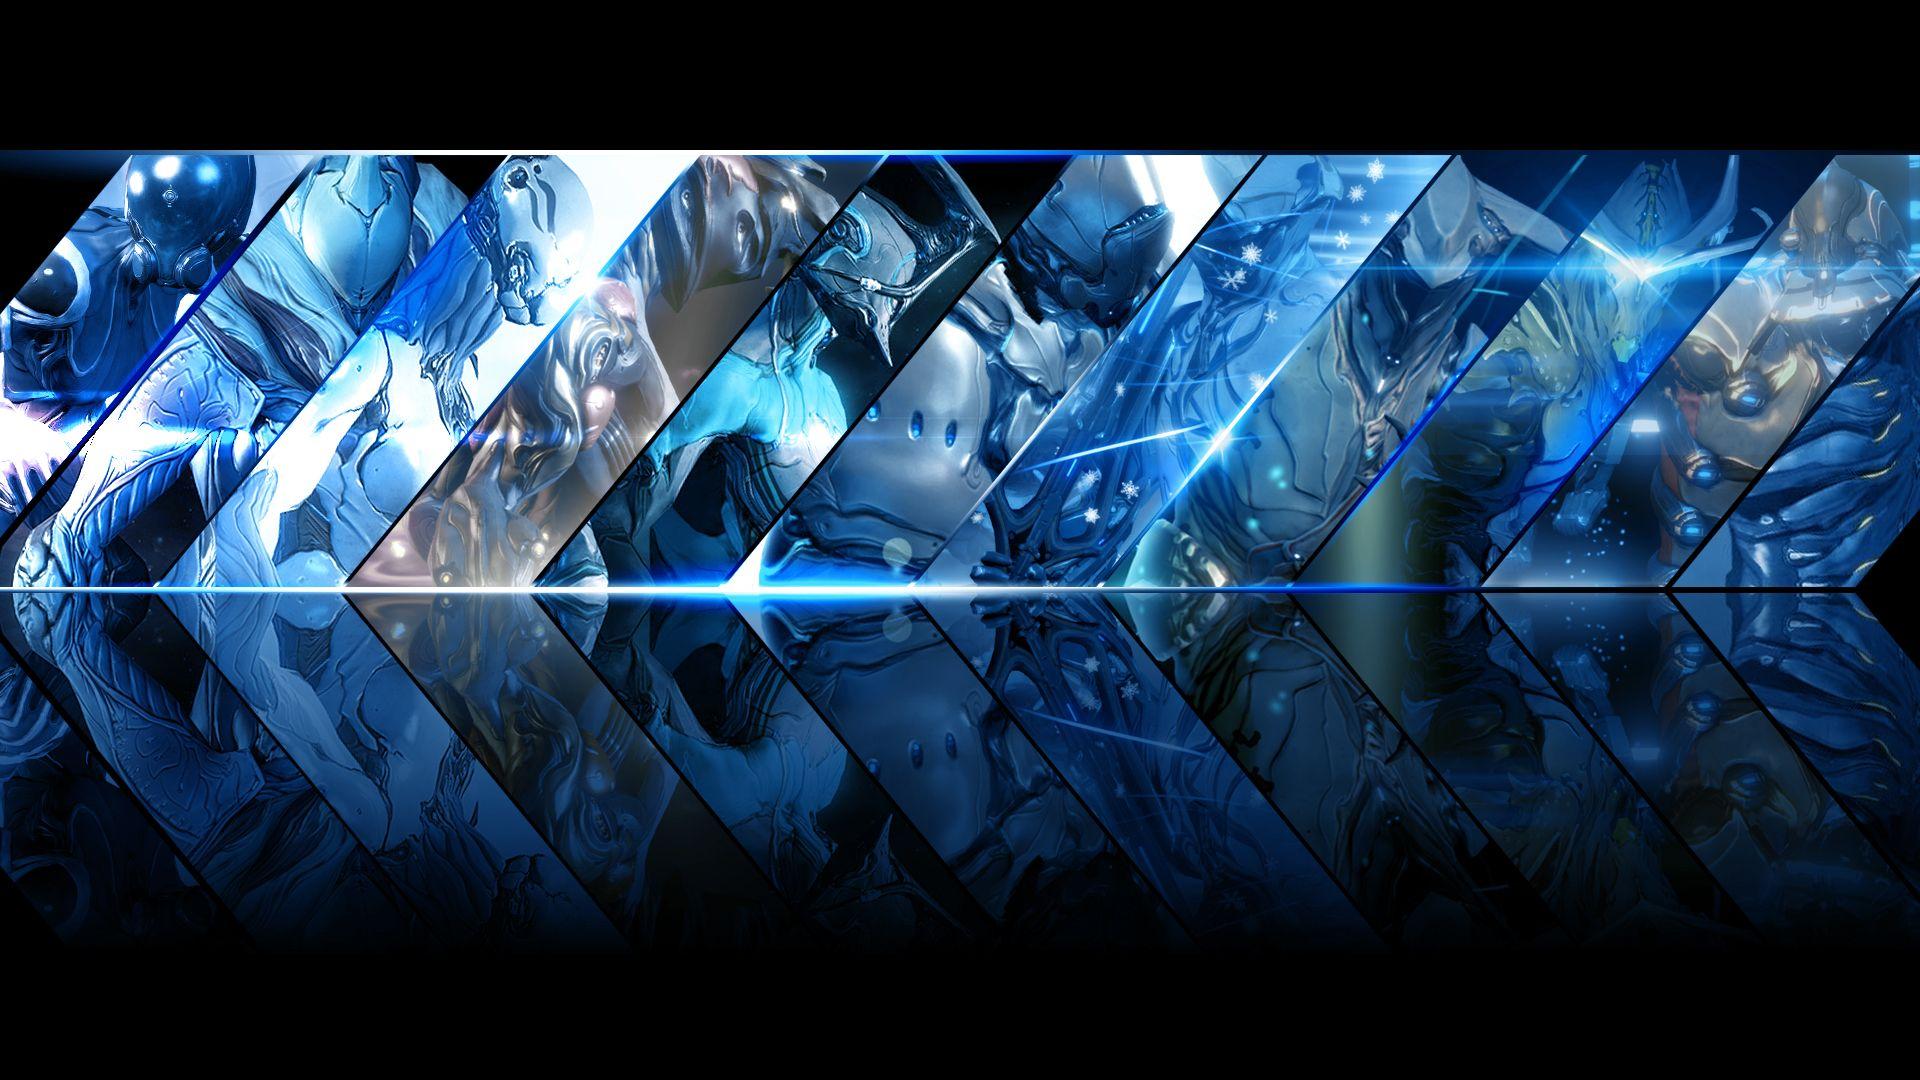 Killzone Shadow Fall Wallpaper 1080p Free Warframe Wallpaper 1920x1080 25593